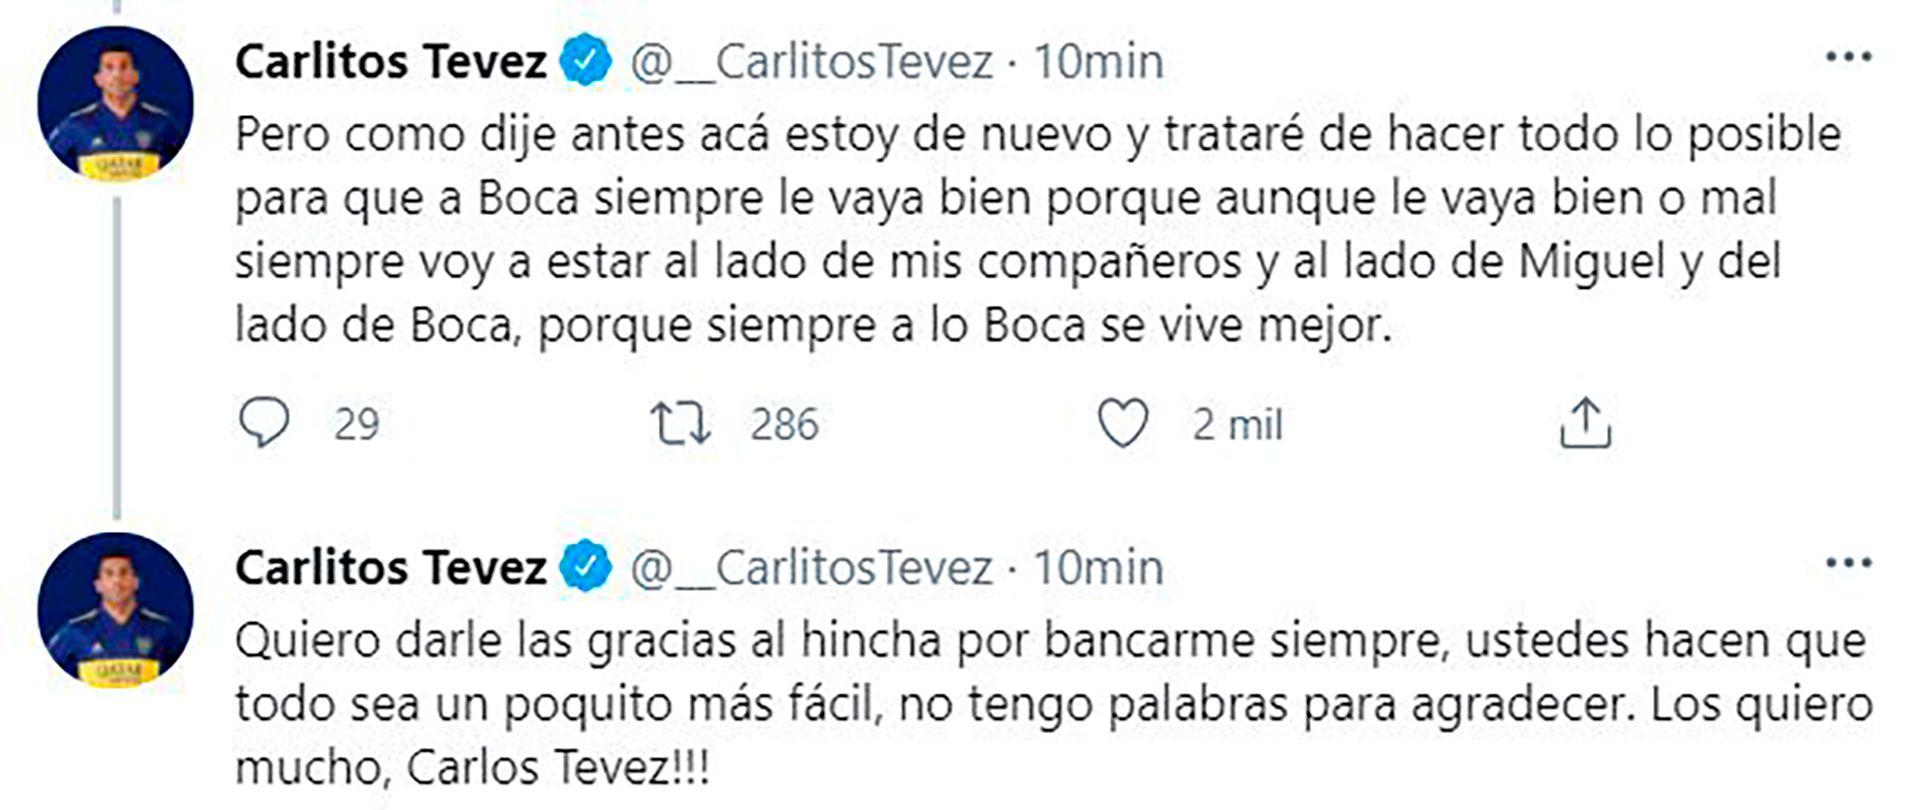 Mensaje de Tevez en Twitter